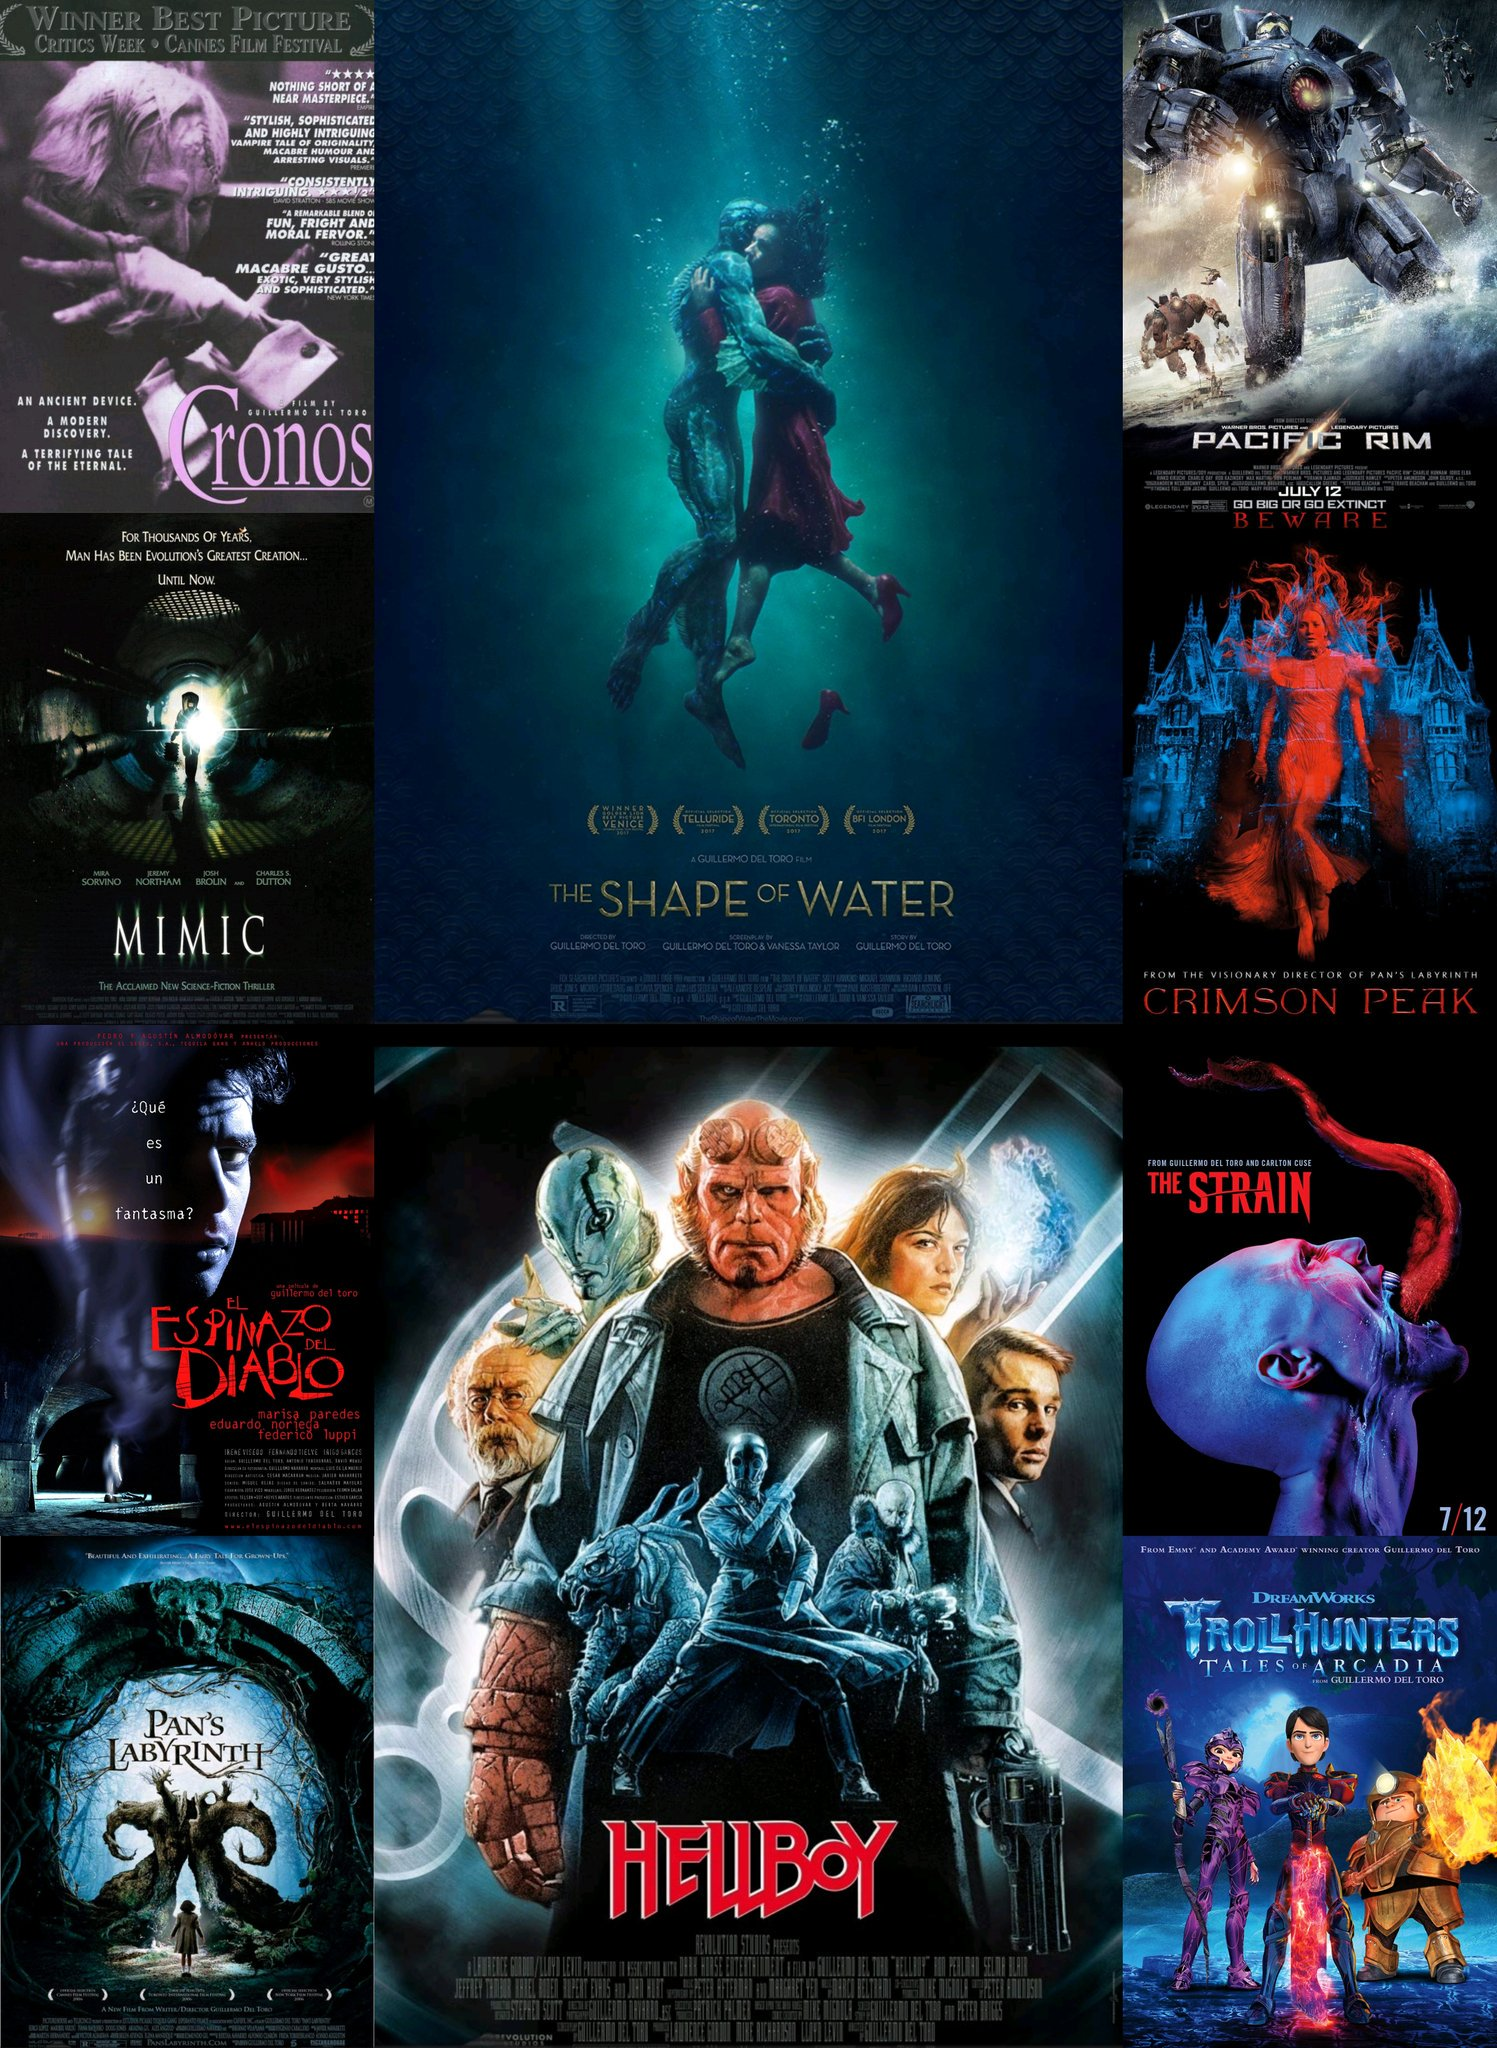 ¡Happy Birthday Guillermo del Toro!